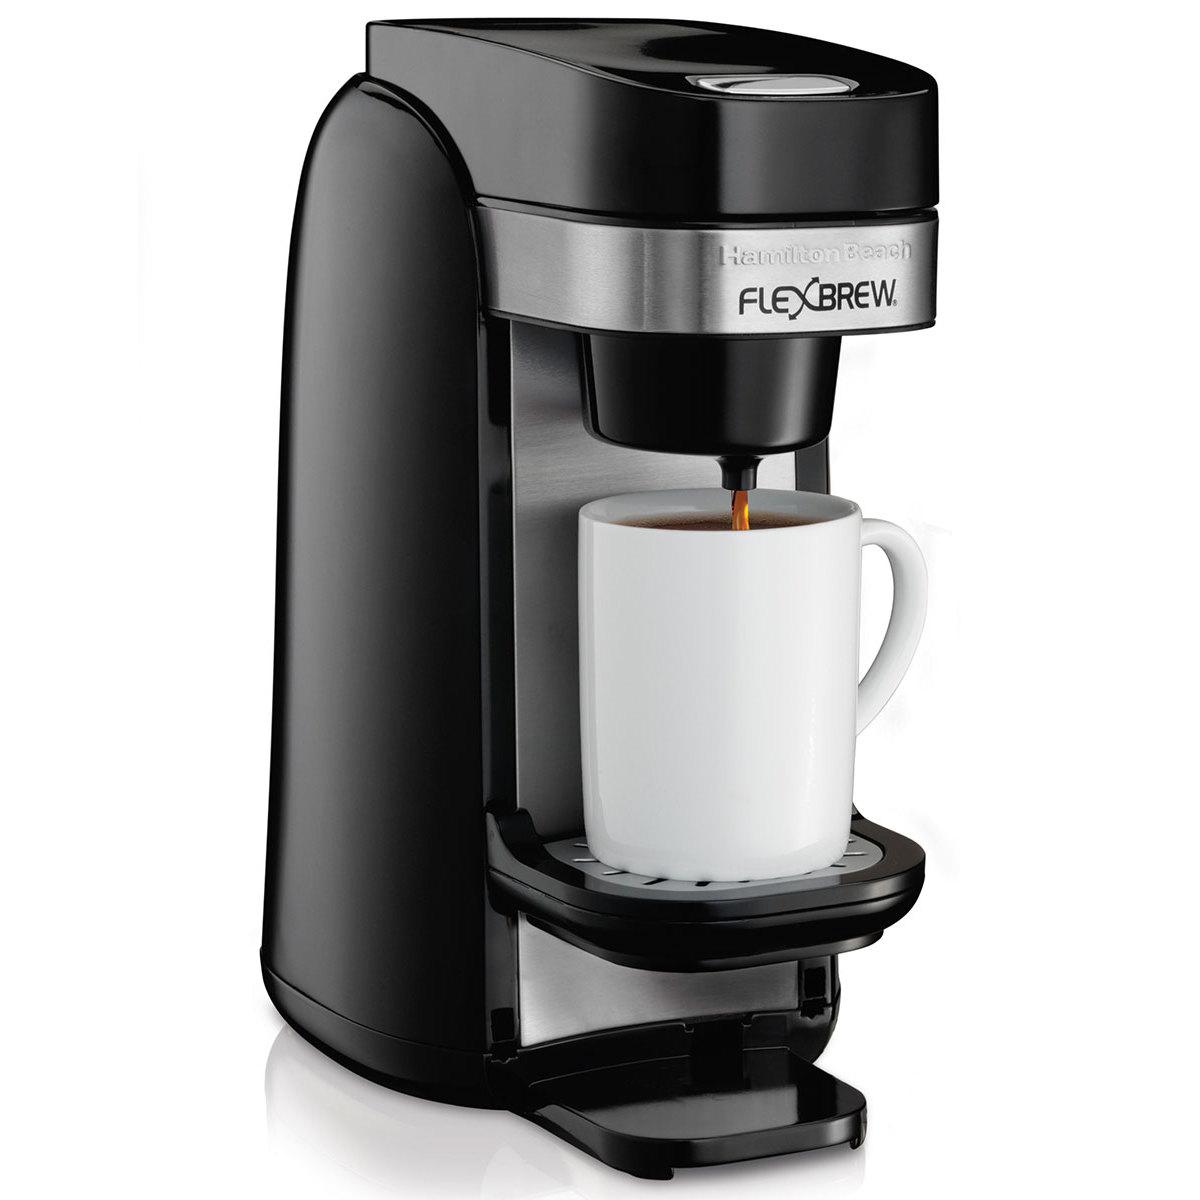 Flexbrew® Single-Serve Coffee Maker, Black (49997R)